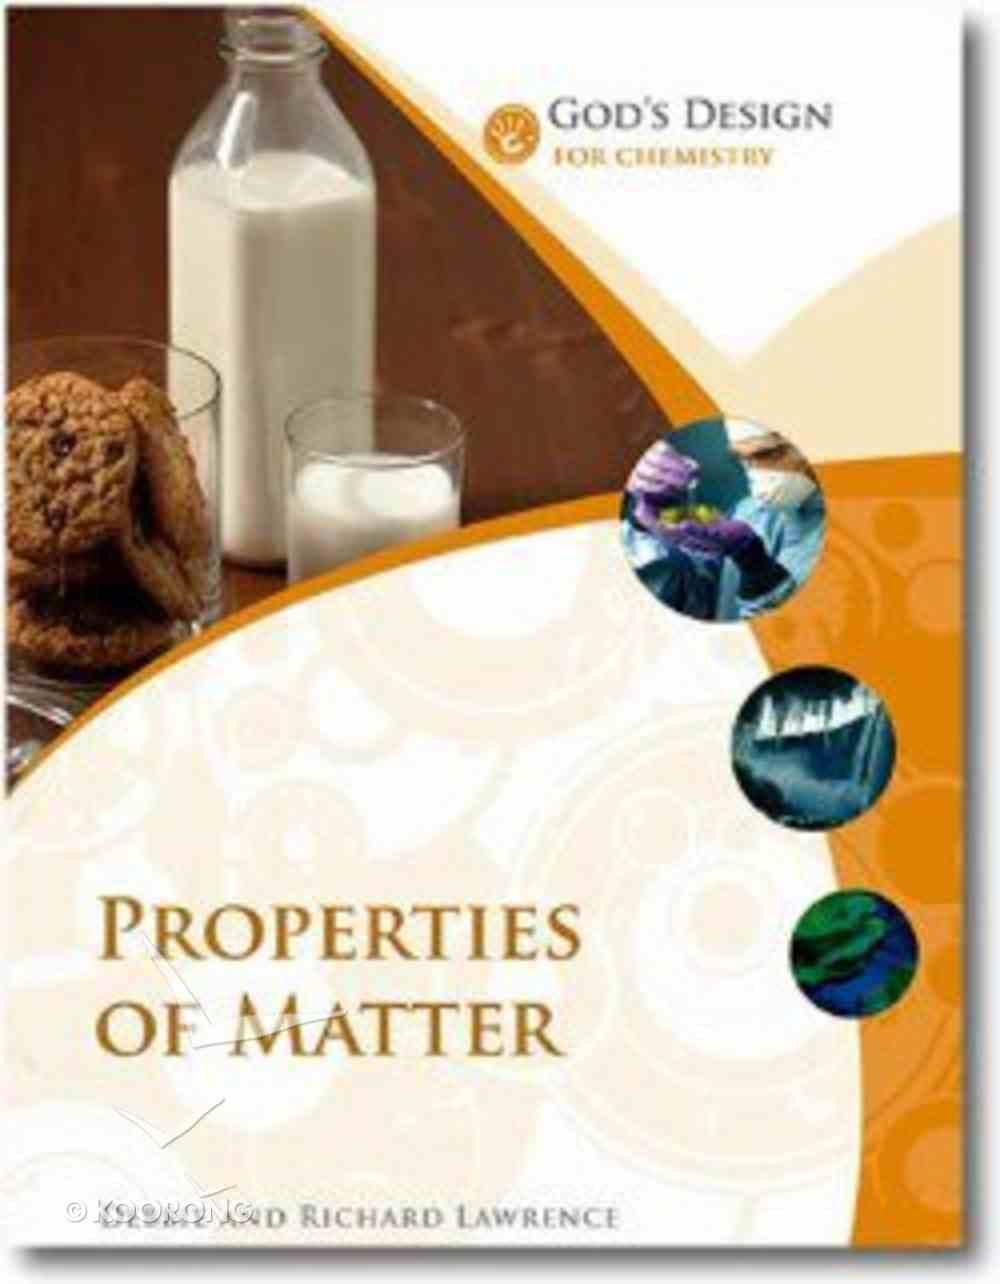 Properties of Matter (God's Design Series) Paperback